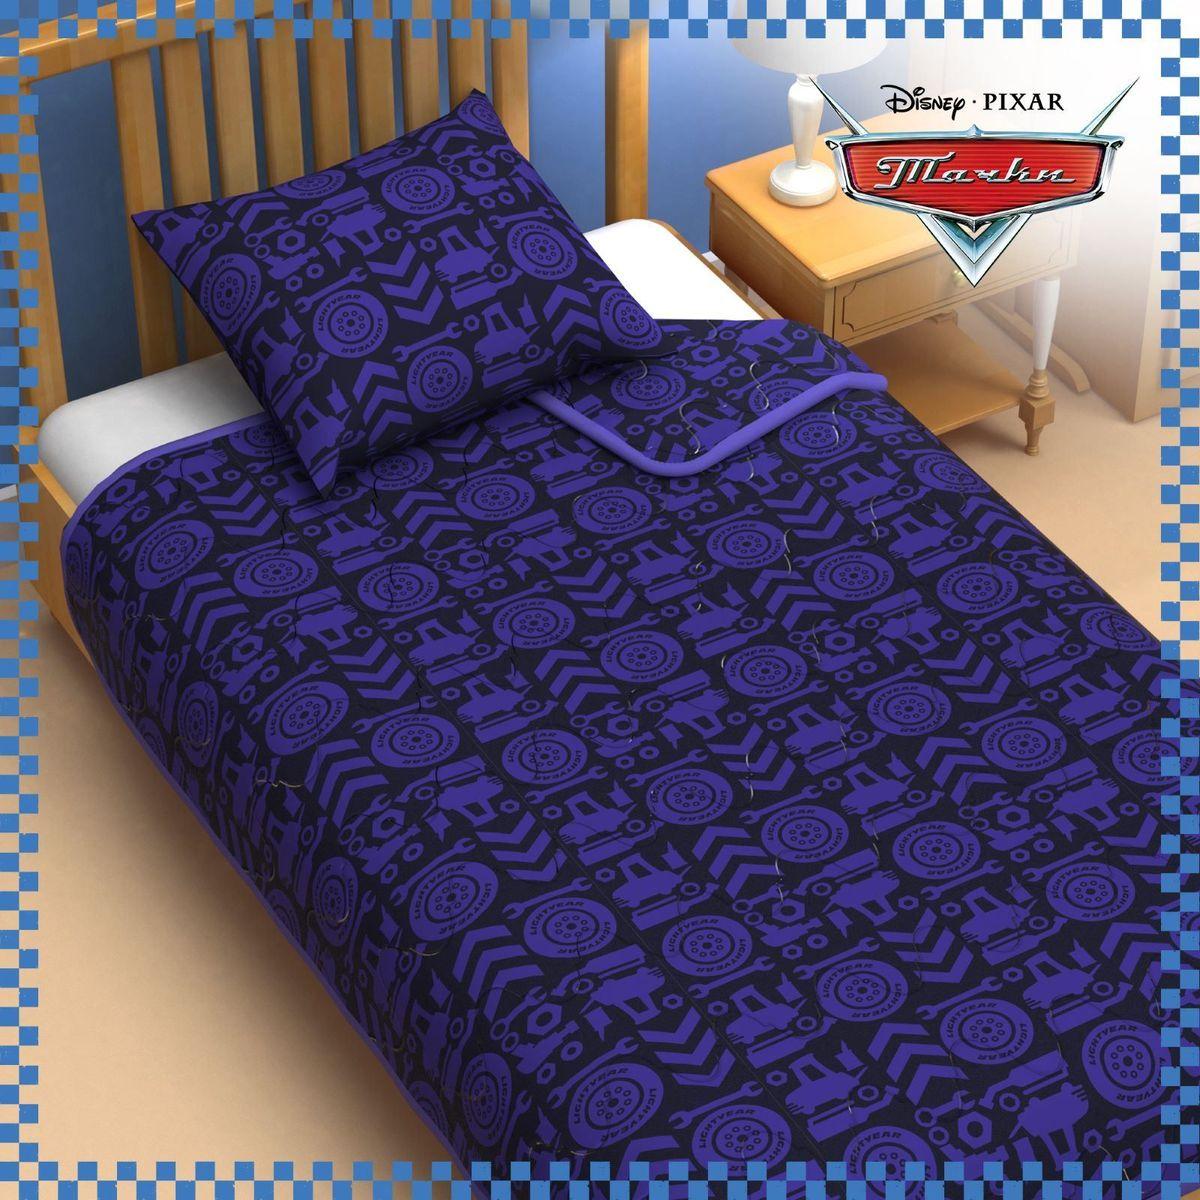 Disney Одеяло 1,5 спальное Тачки цвет синий 140 х 205 см - Детский текстиль